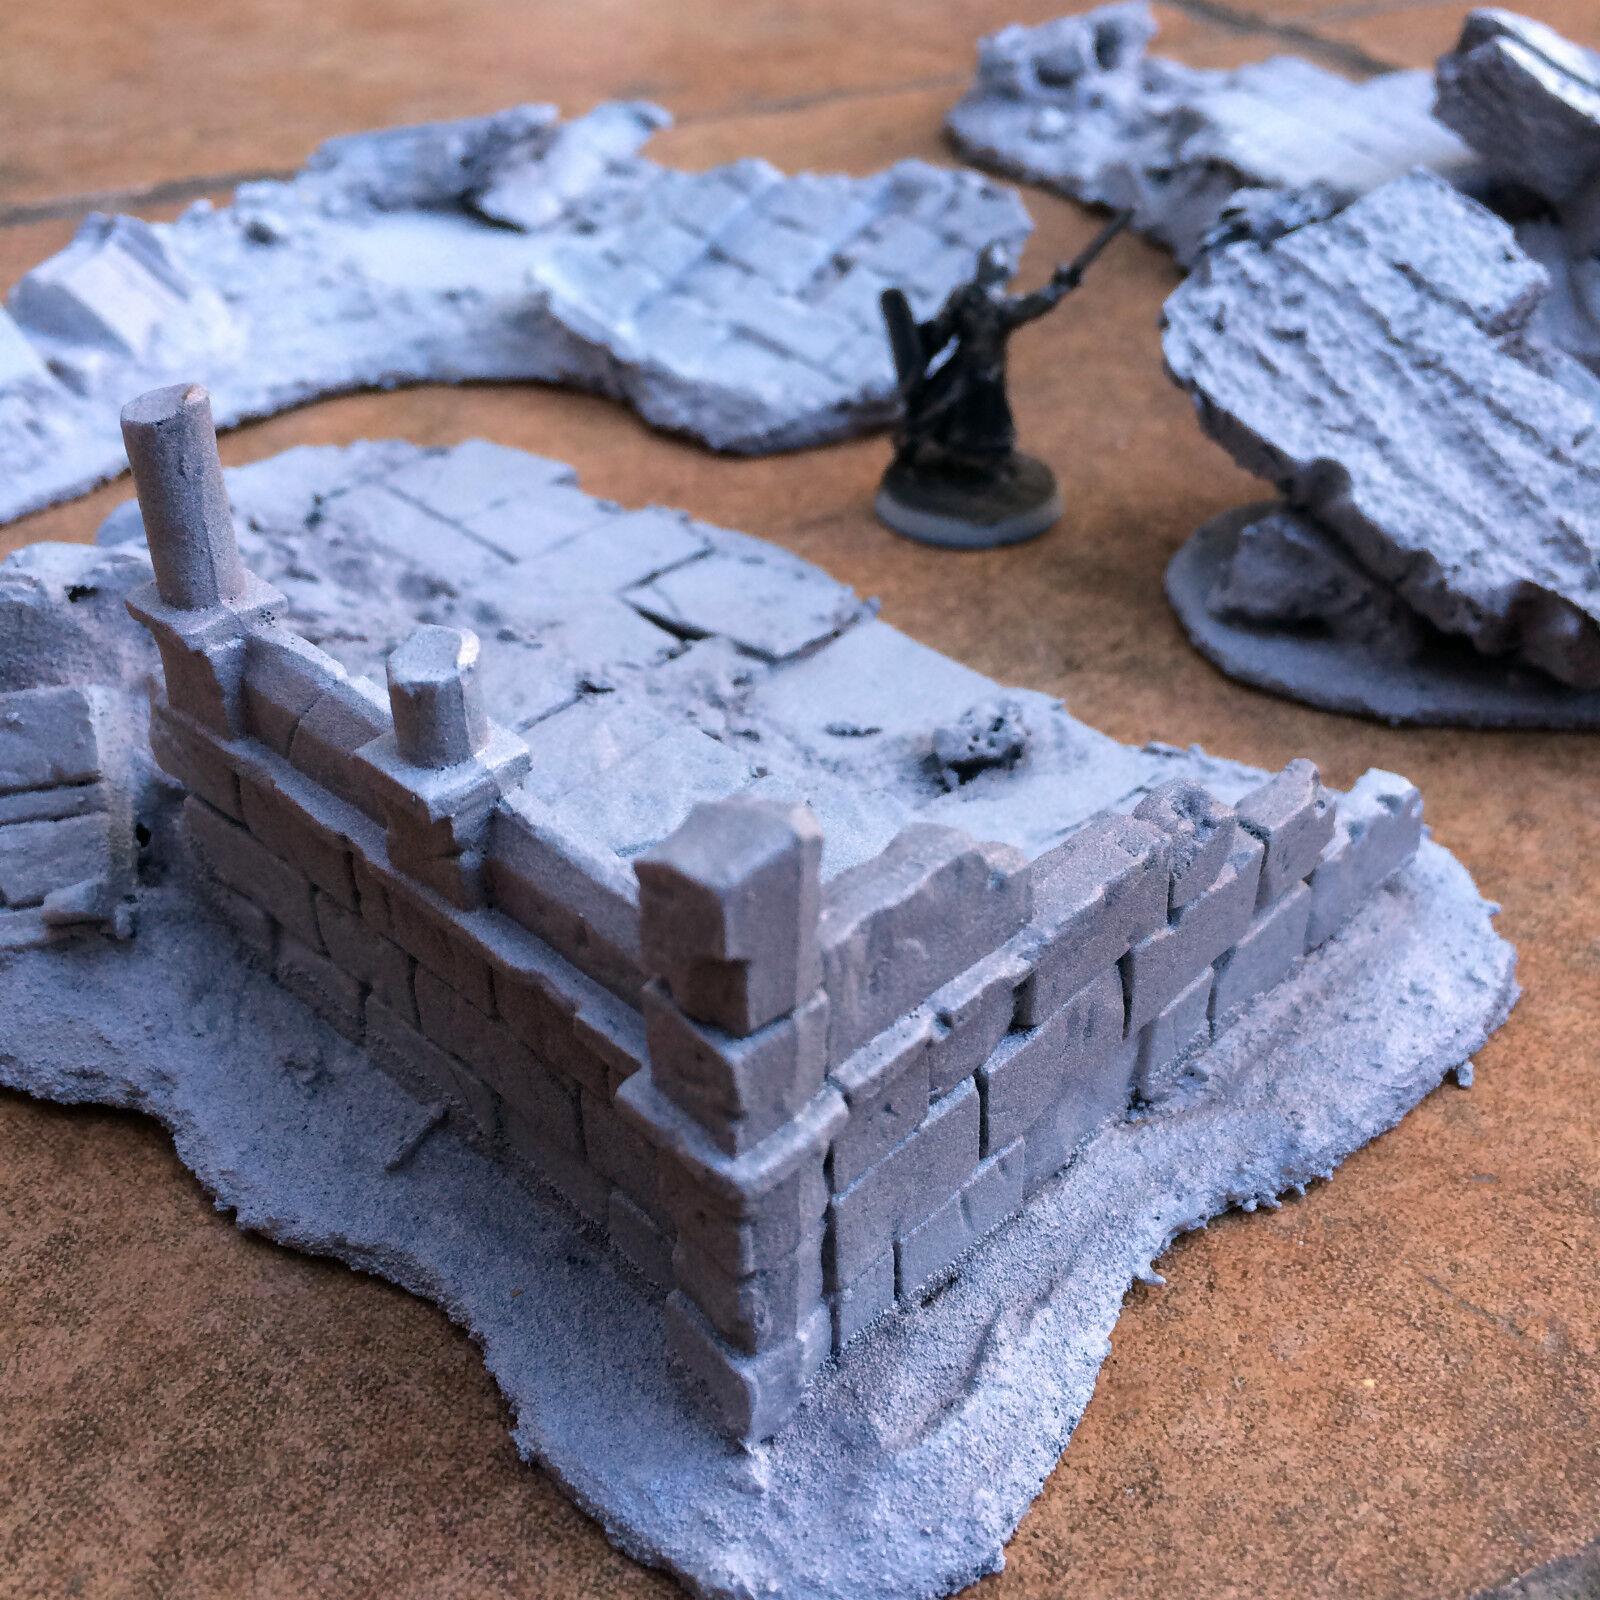 LOTR scenery - 4 x handmade ruins (LOT 3) - Osgiliath   Gondor terrain 28mm